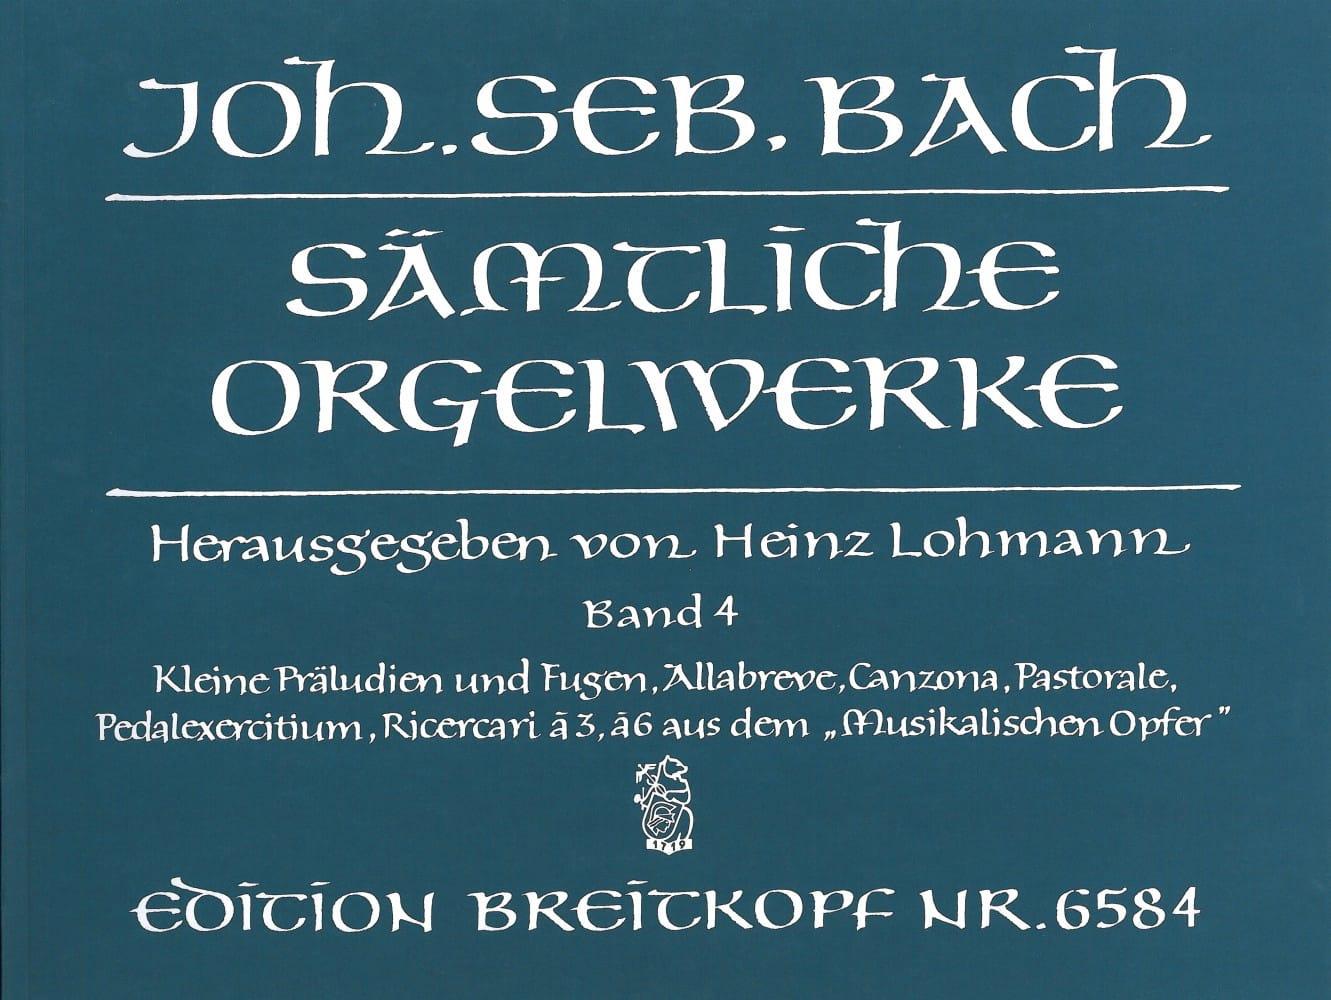 Sämtliche Orgelwerke Volume 4 - BACH - Partition - laflutedepan.com